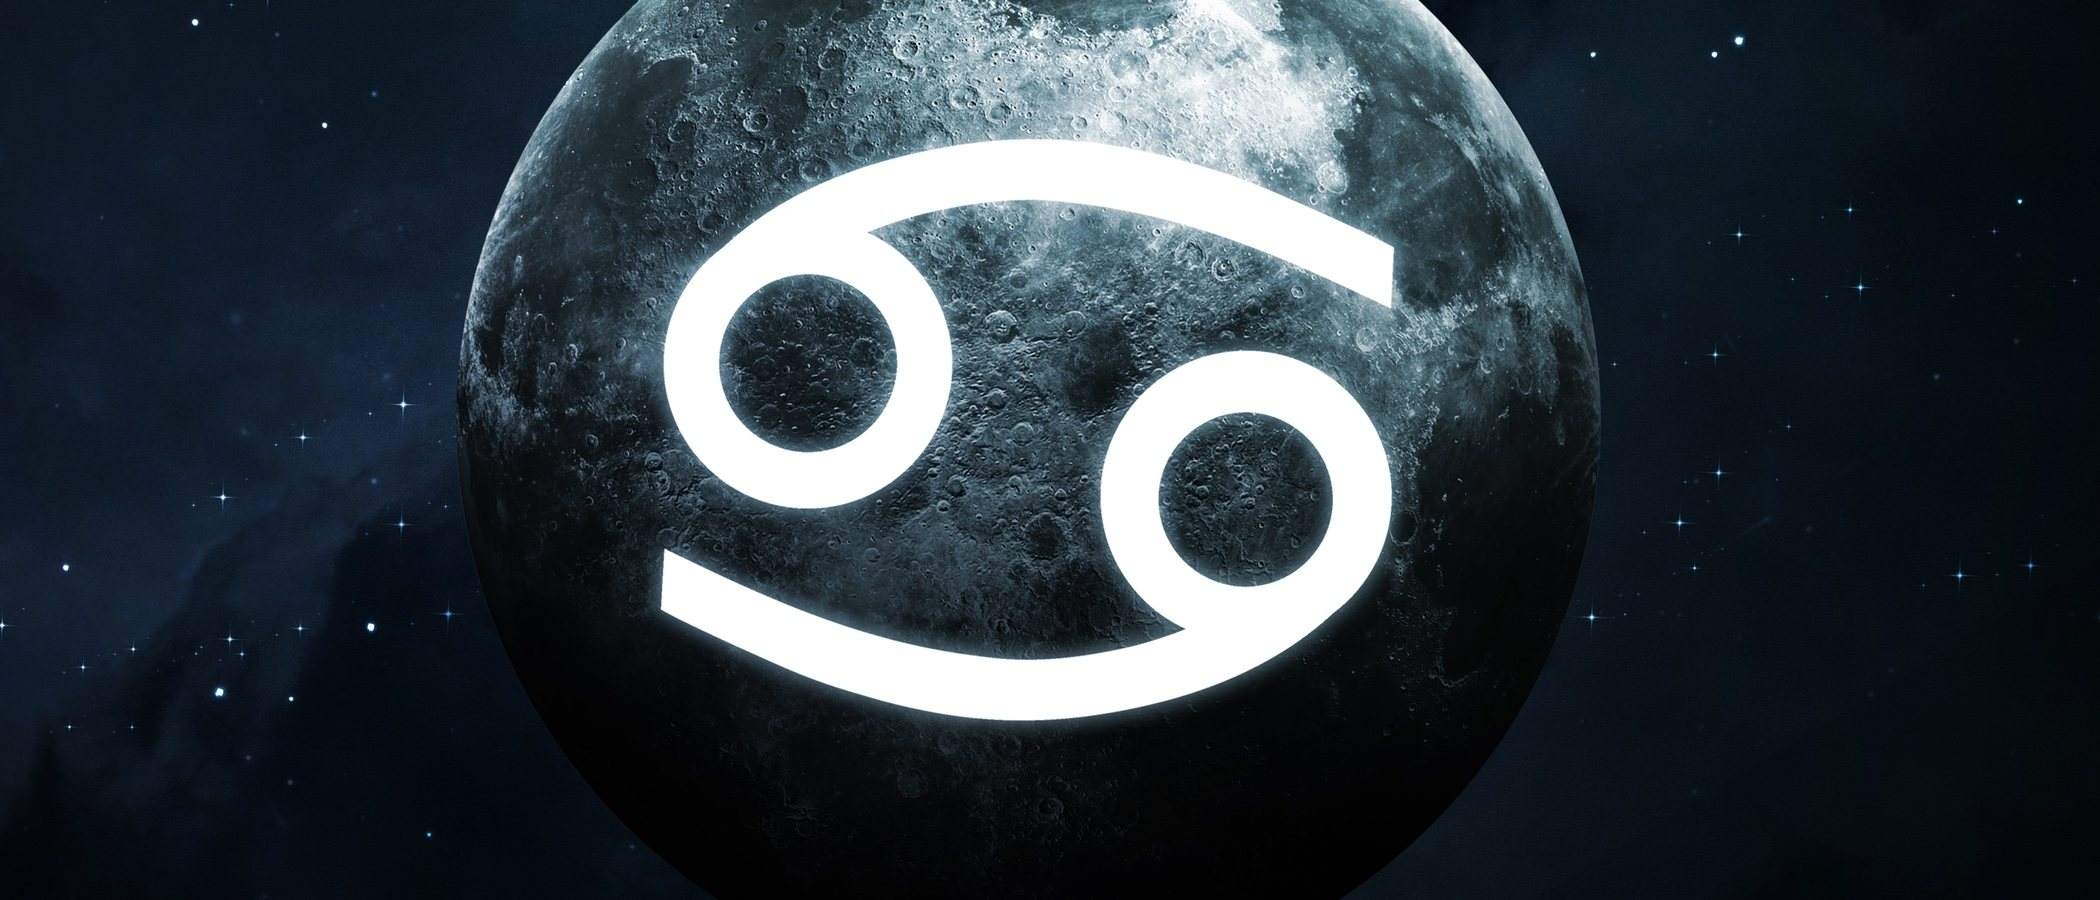 Horóscopo enero 2019: Cáncer